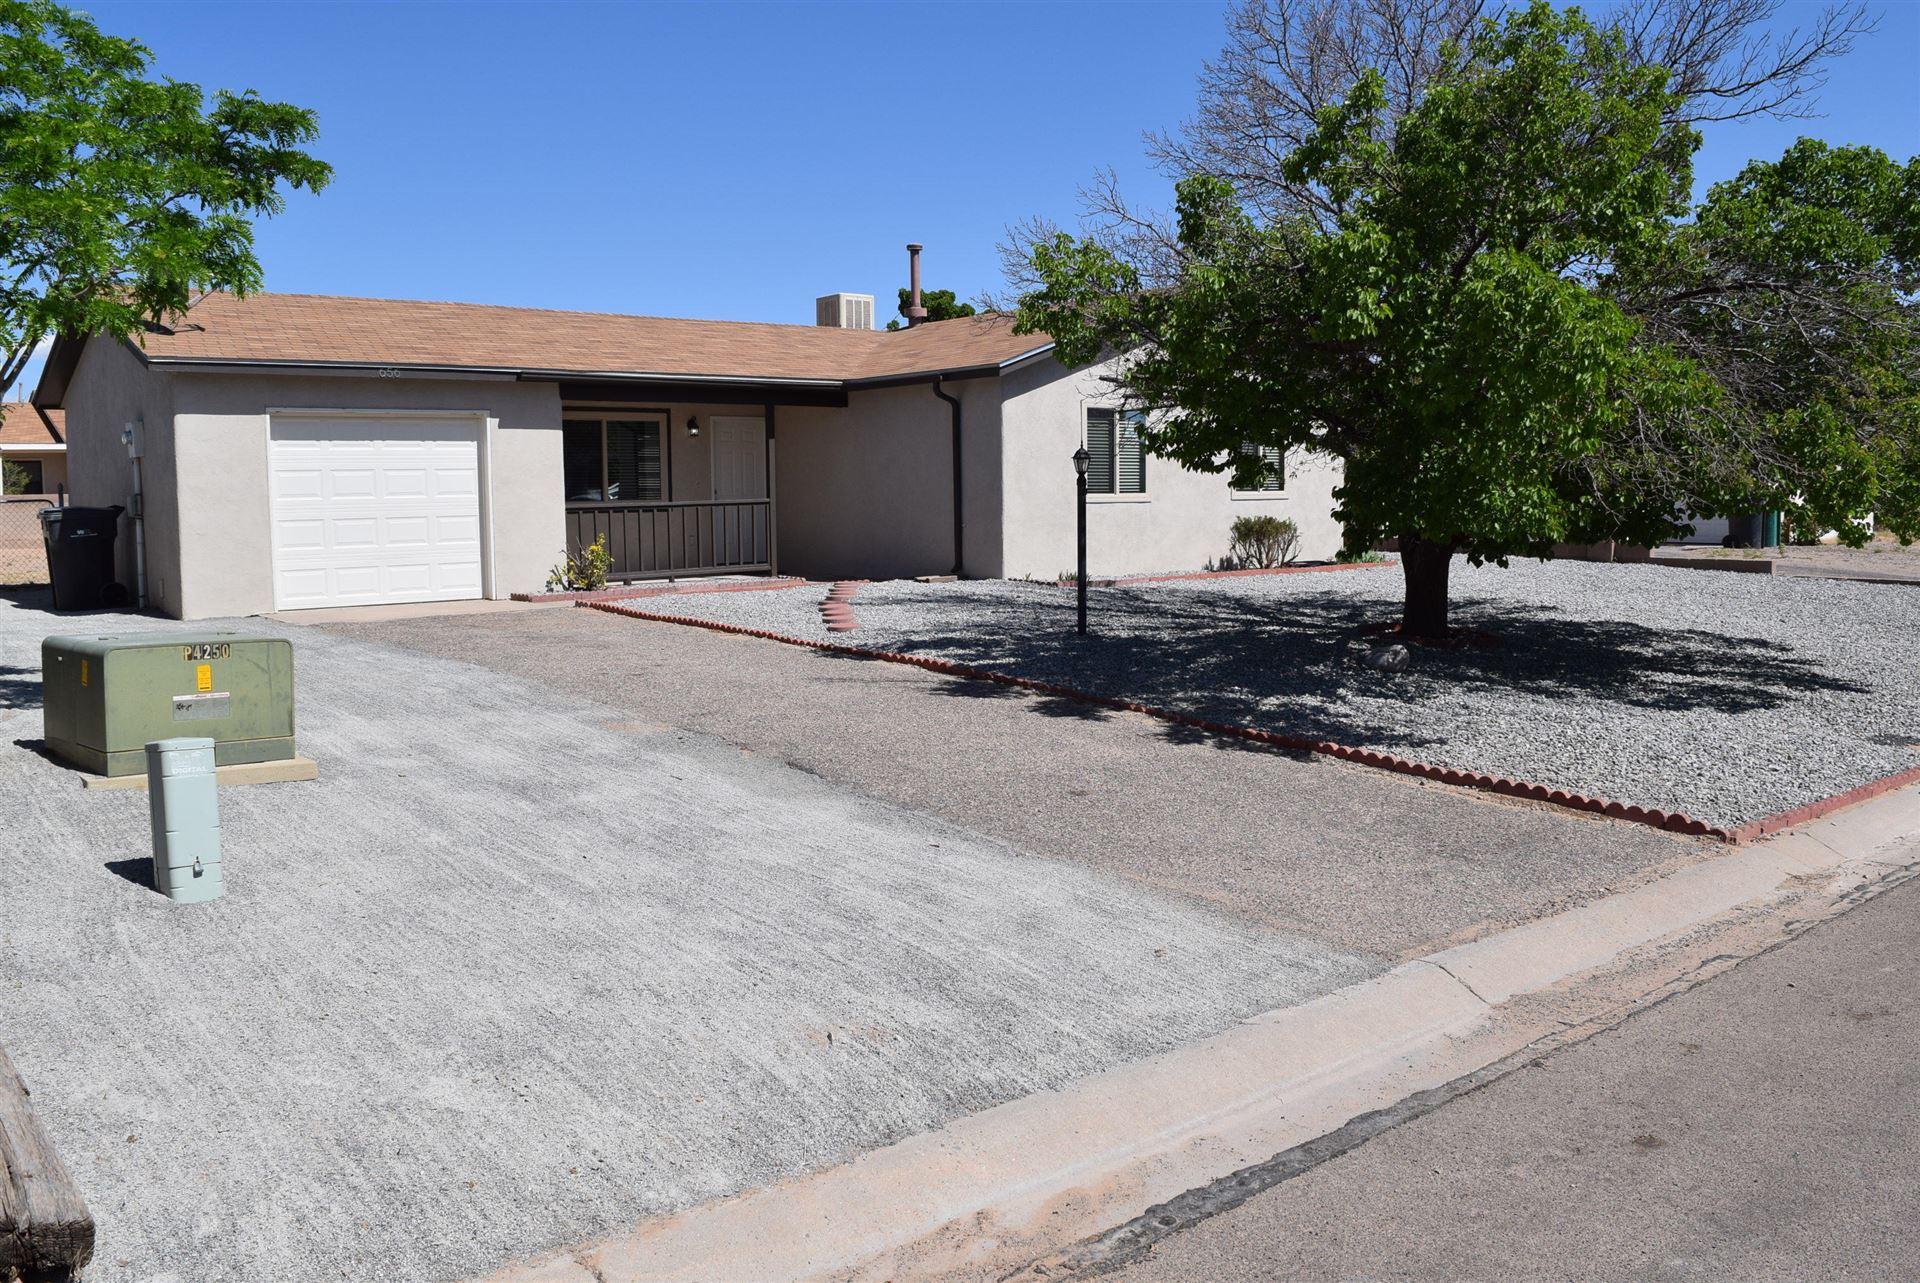 656 ORCHID Drive SW, Rio Rancho, NM 87124 - MLS#: 991872